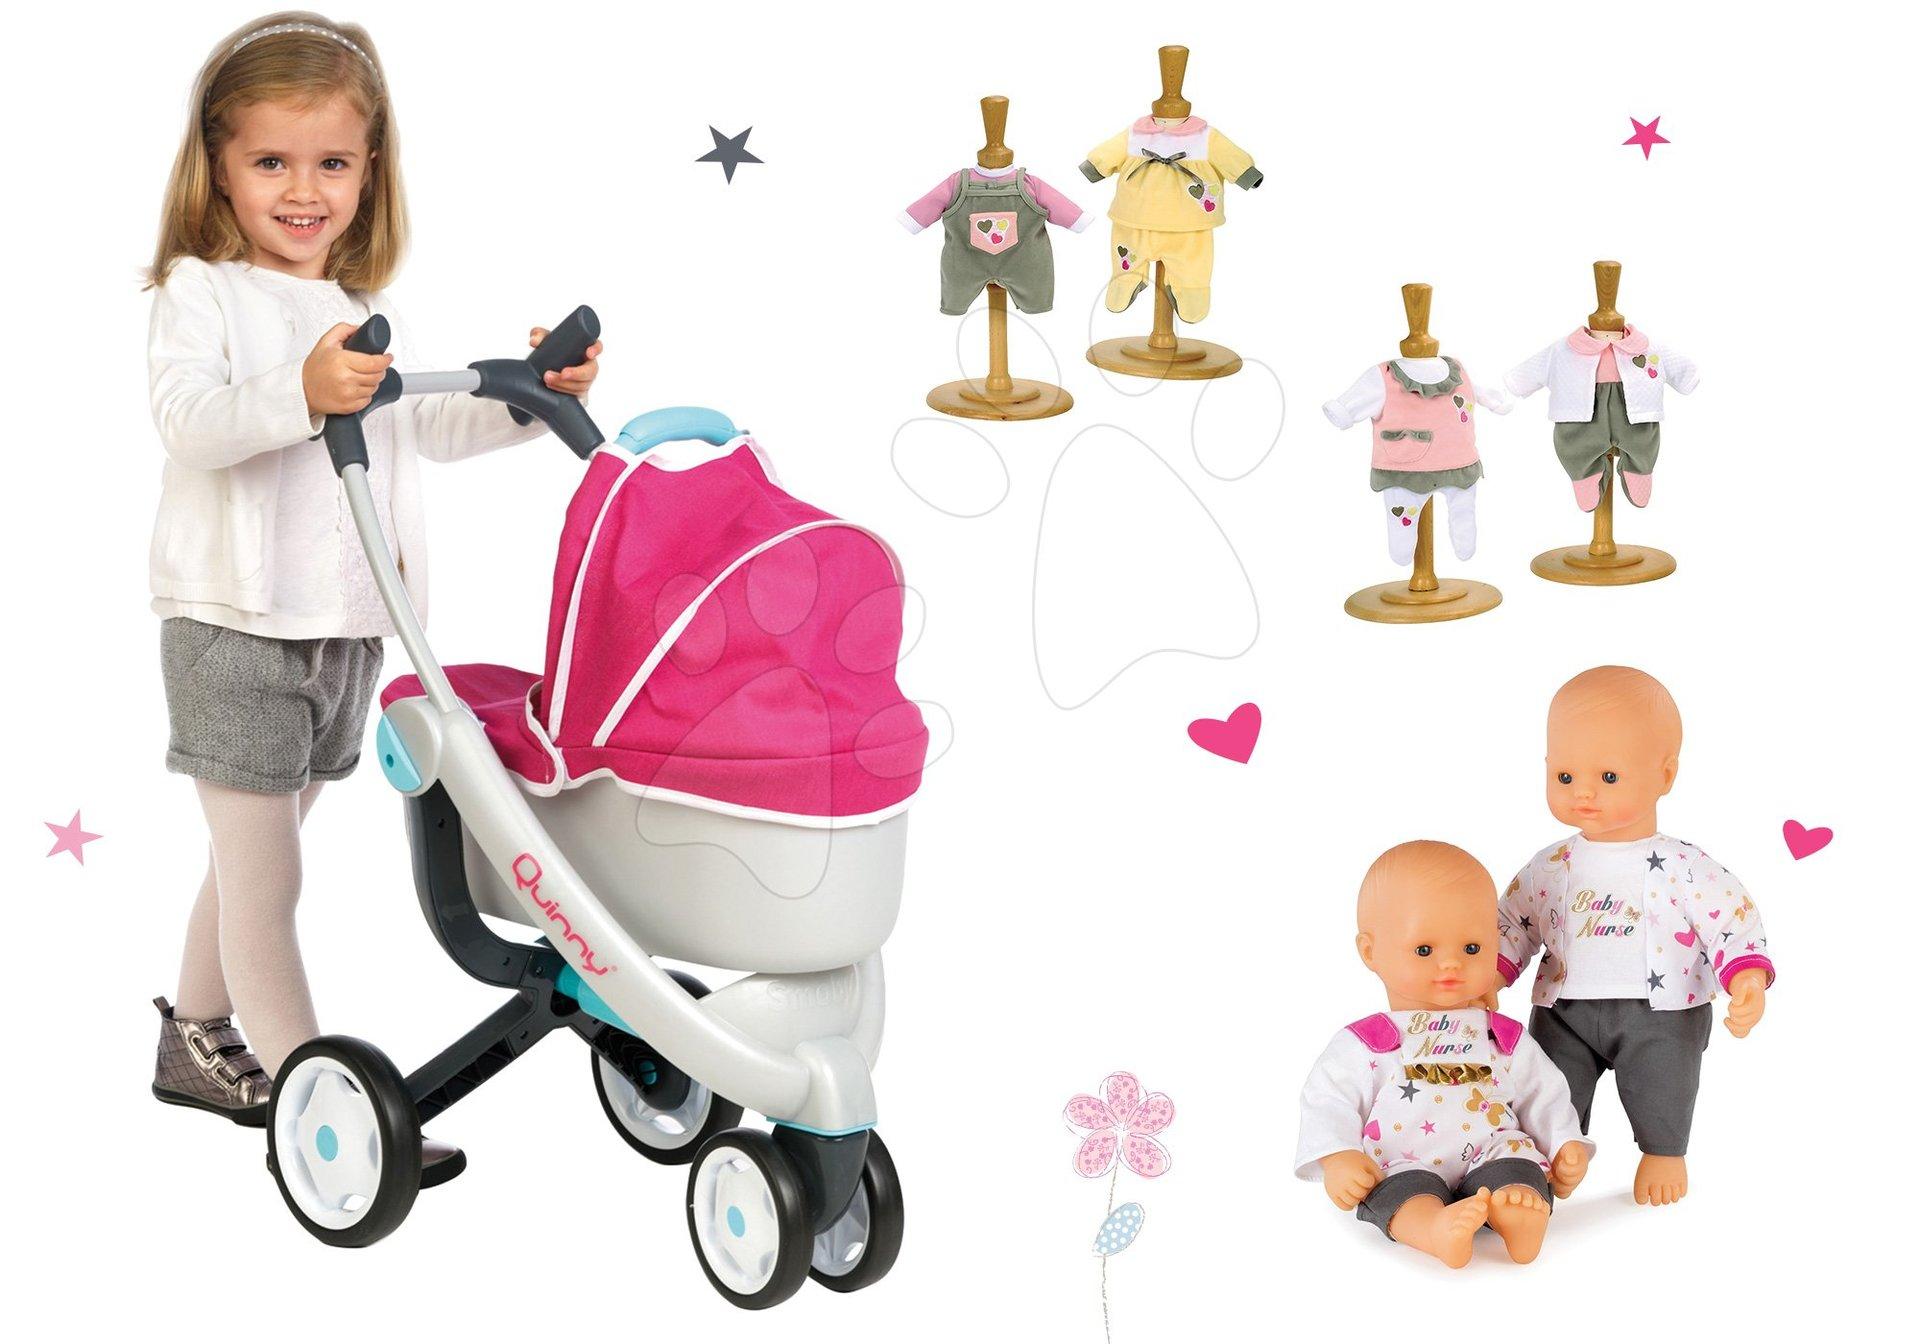 Set kočárek pro panenku Maxi Cosi & Quinny 3v1 Smoby a panenka se šatičkami 32 cm